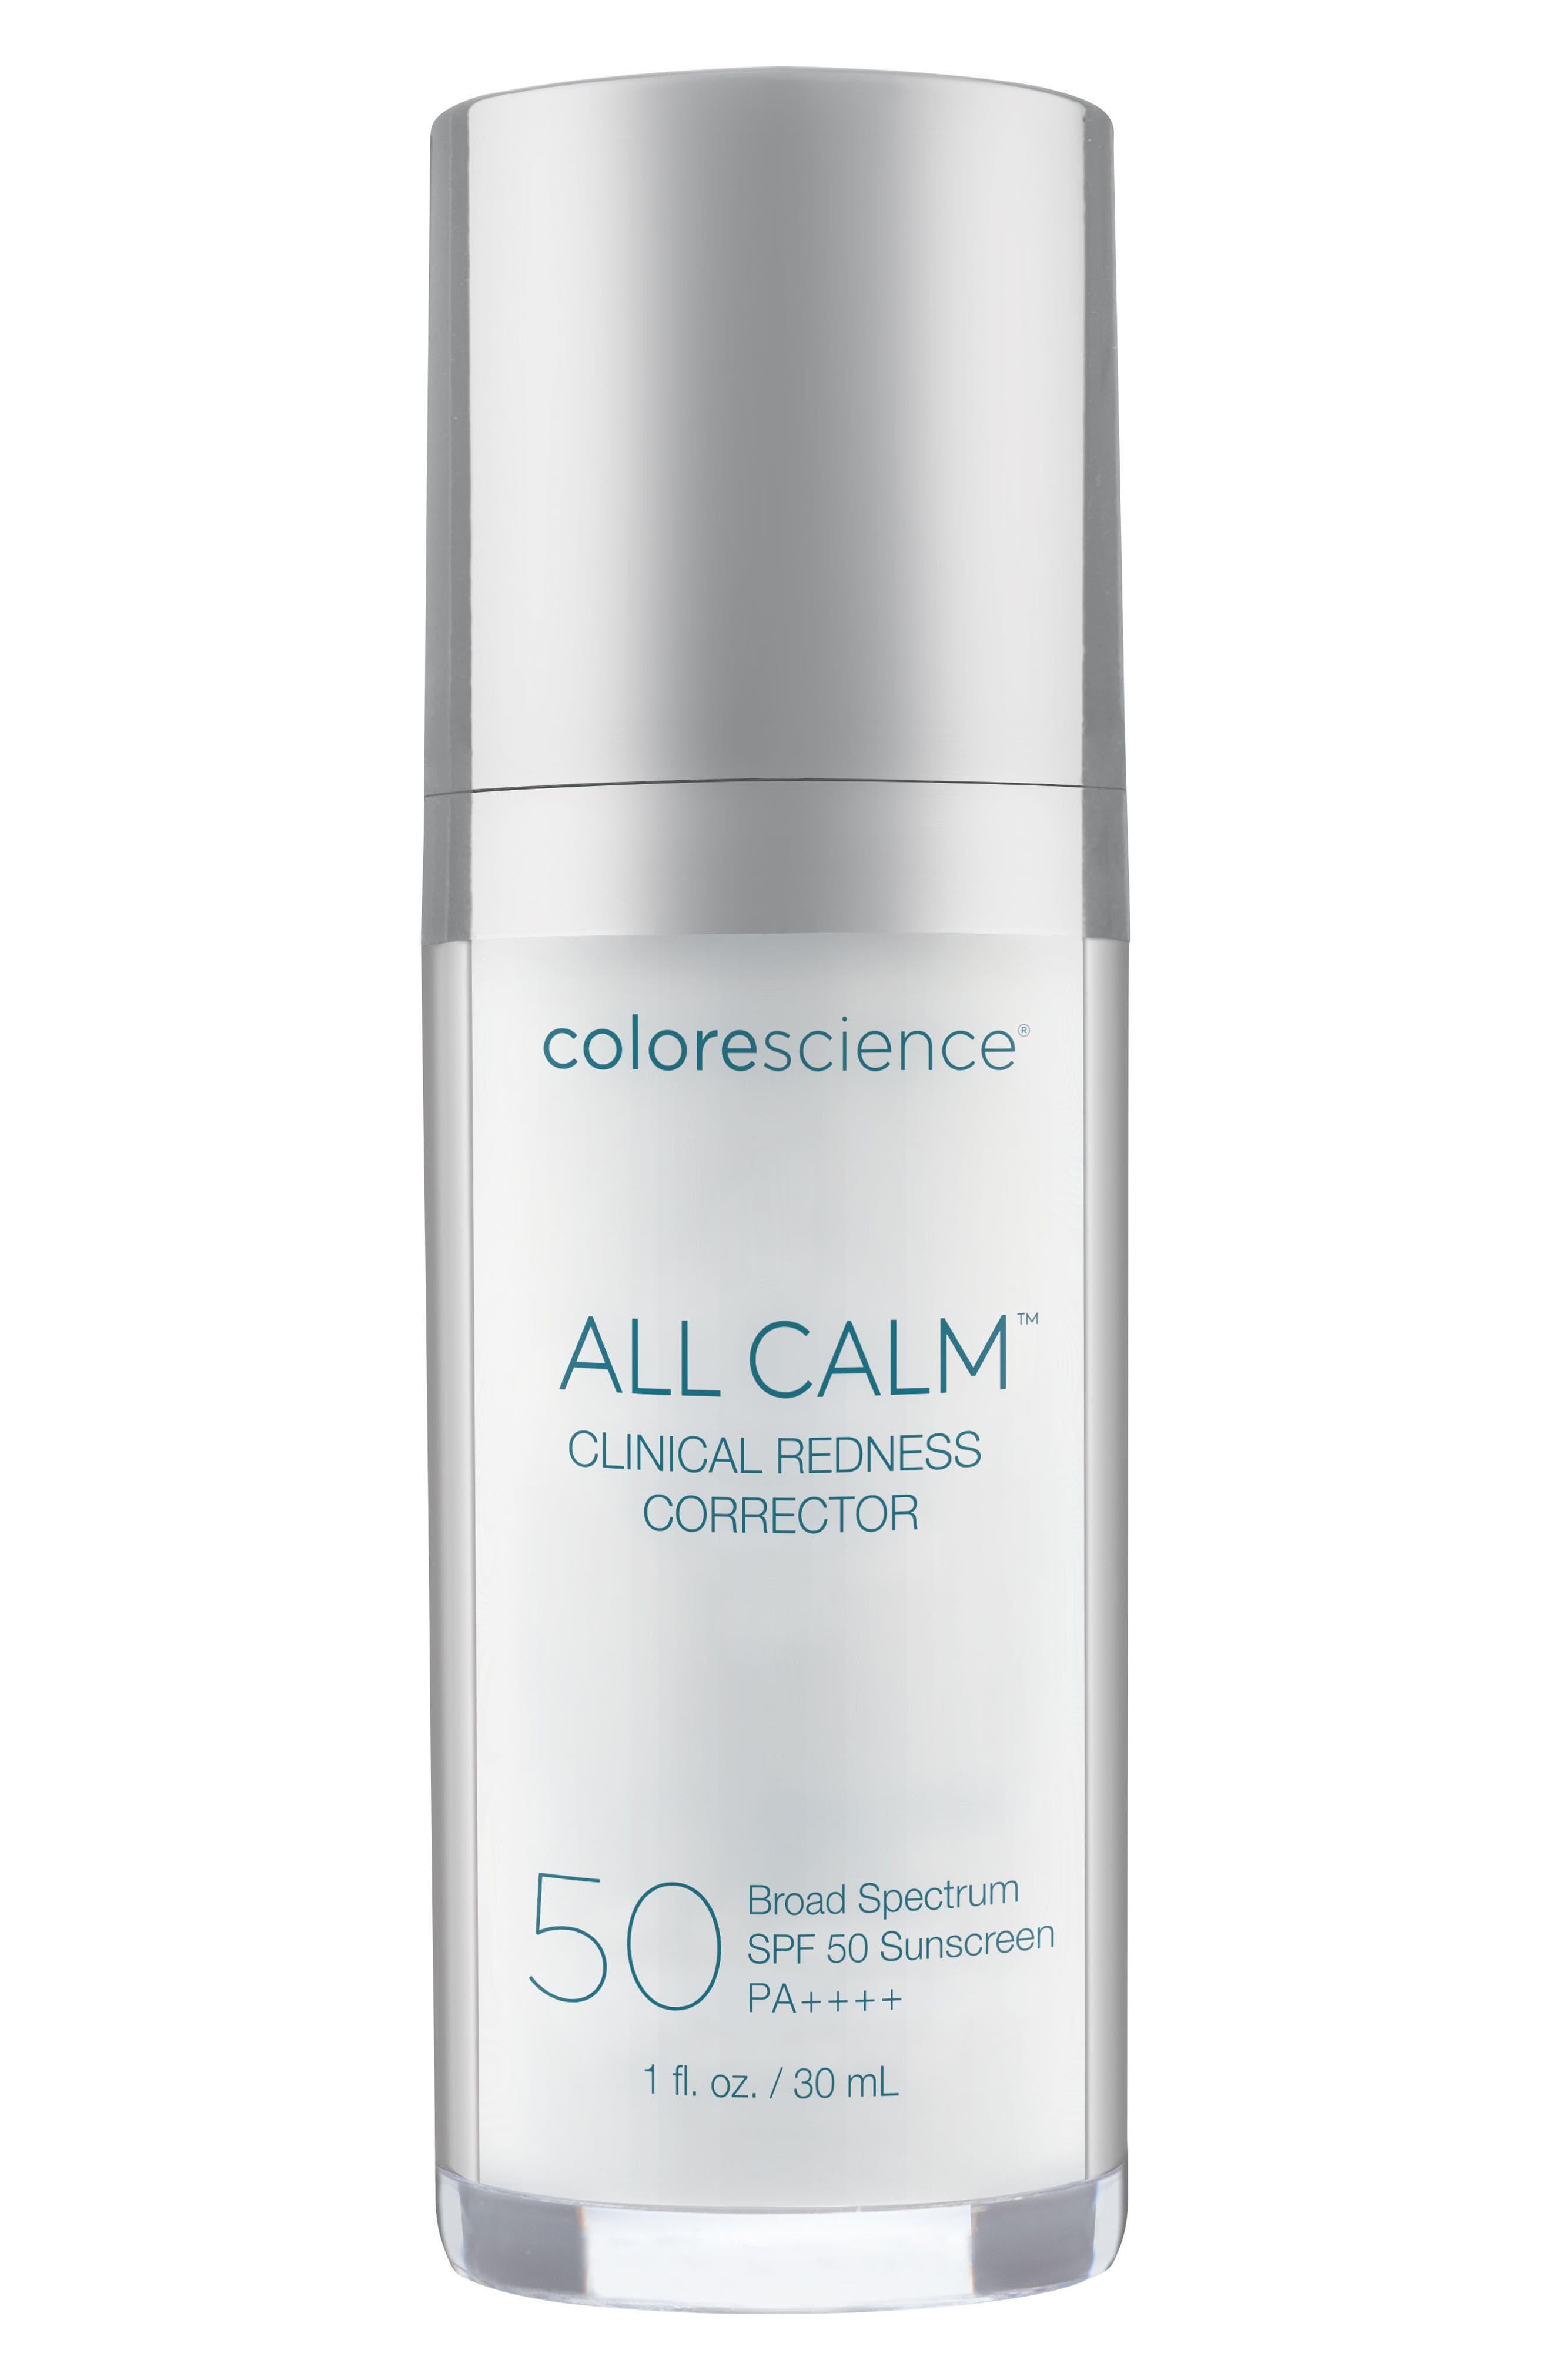 Colorescience All Calm(TM) Clinical Redness Corrector Spf 50 Pa++++